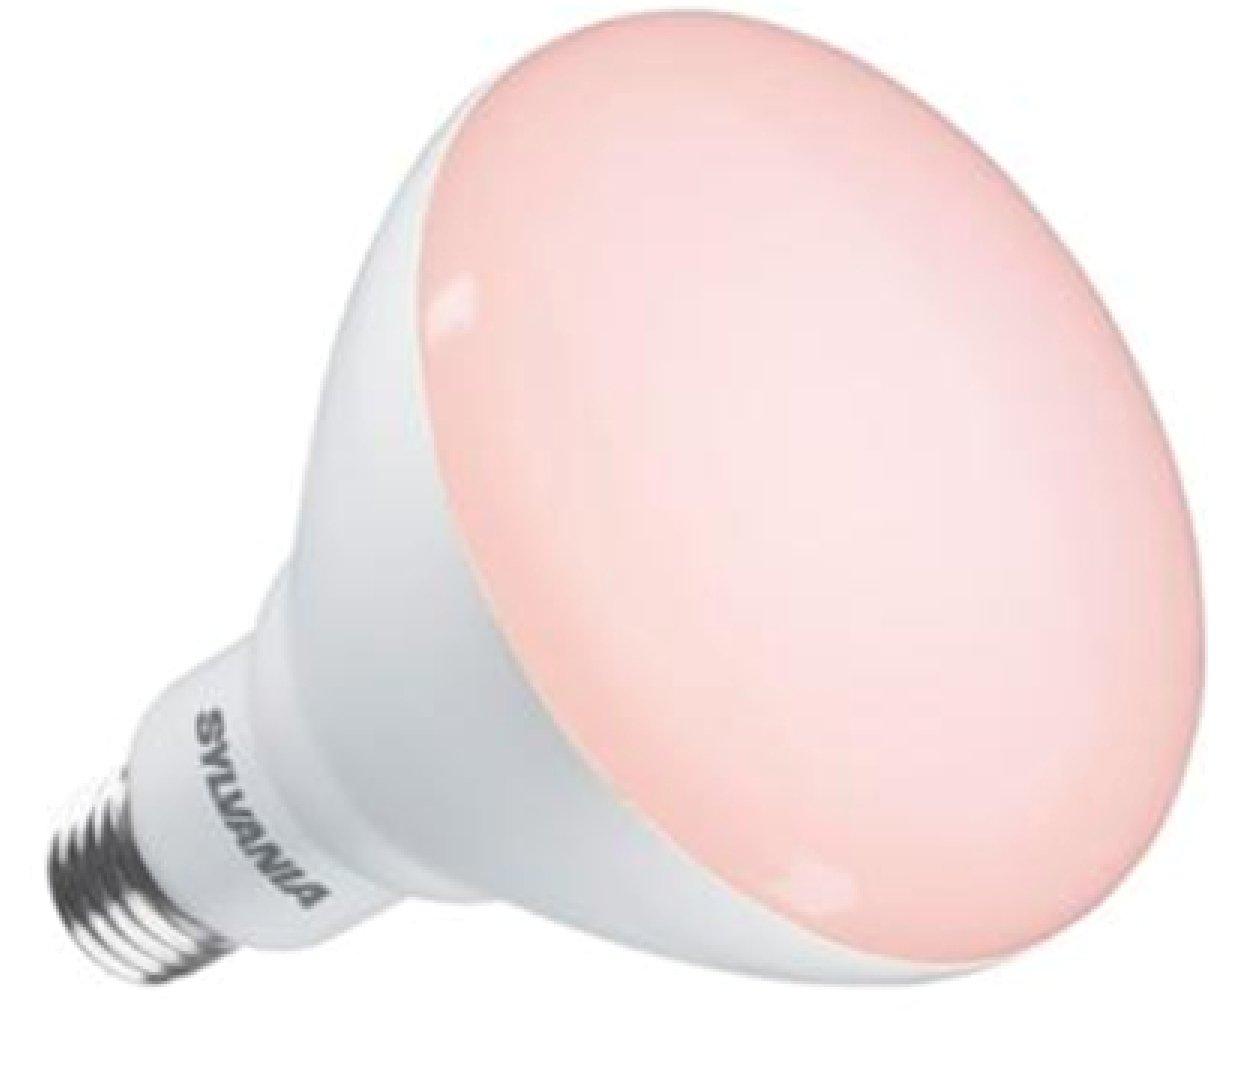 Sylvania LED Grow-Lux E27 Wachstumslampe Vegetative IP44 17W, 1100 lm, 125 mm Durchmesser, 25.000 h Lebensdauer, nicht dimmbar Feilo Sylvania Germany GmbH